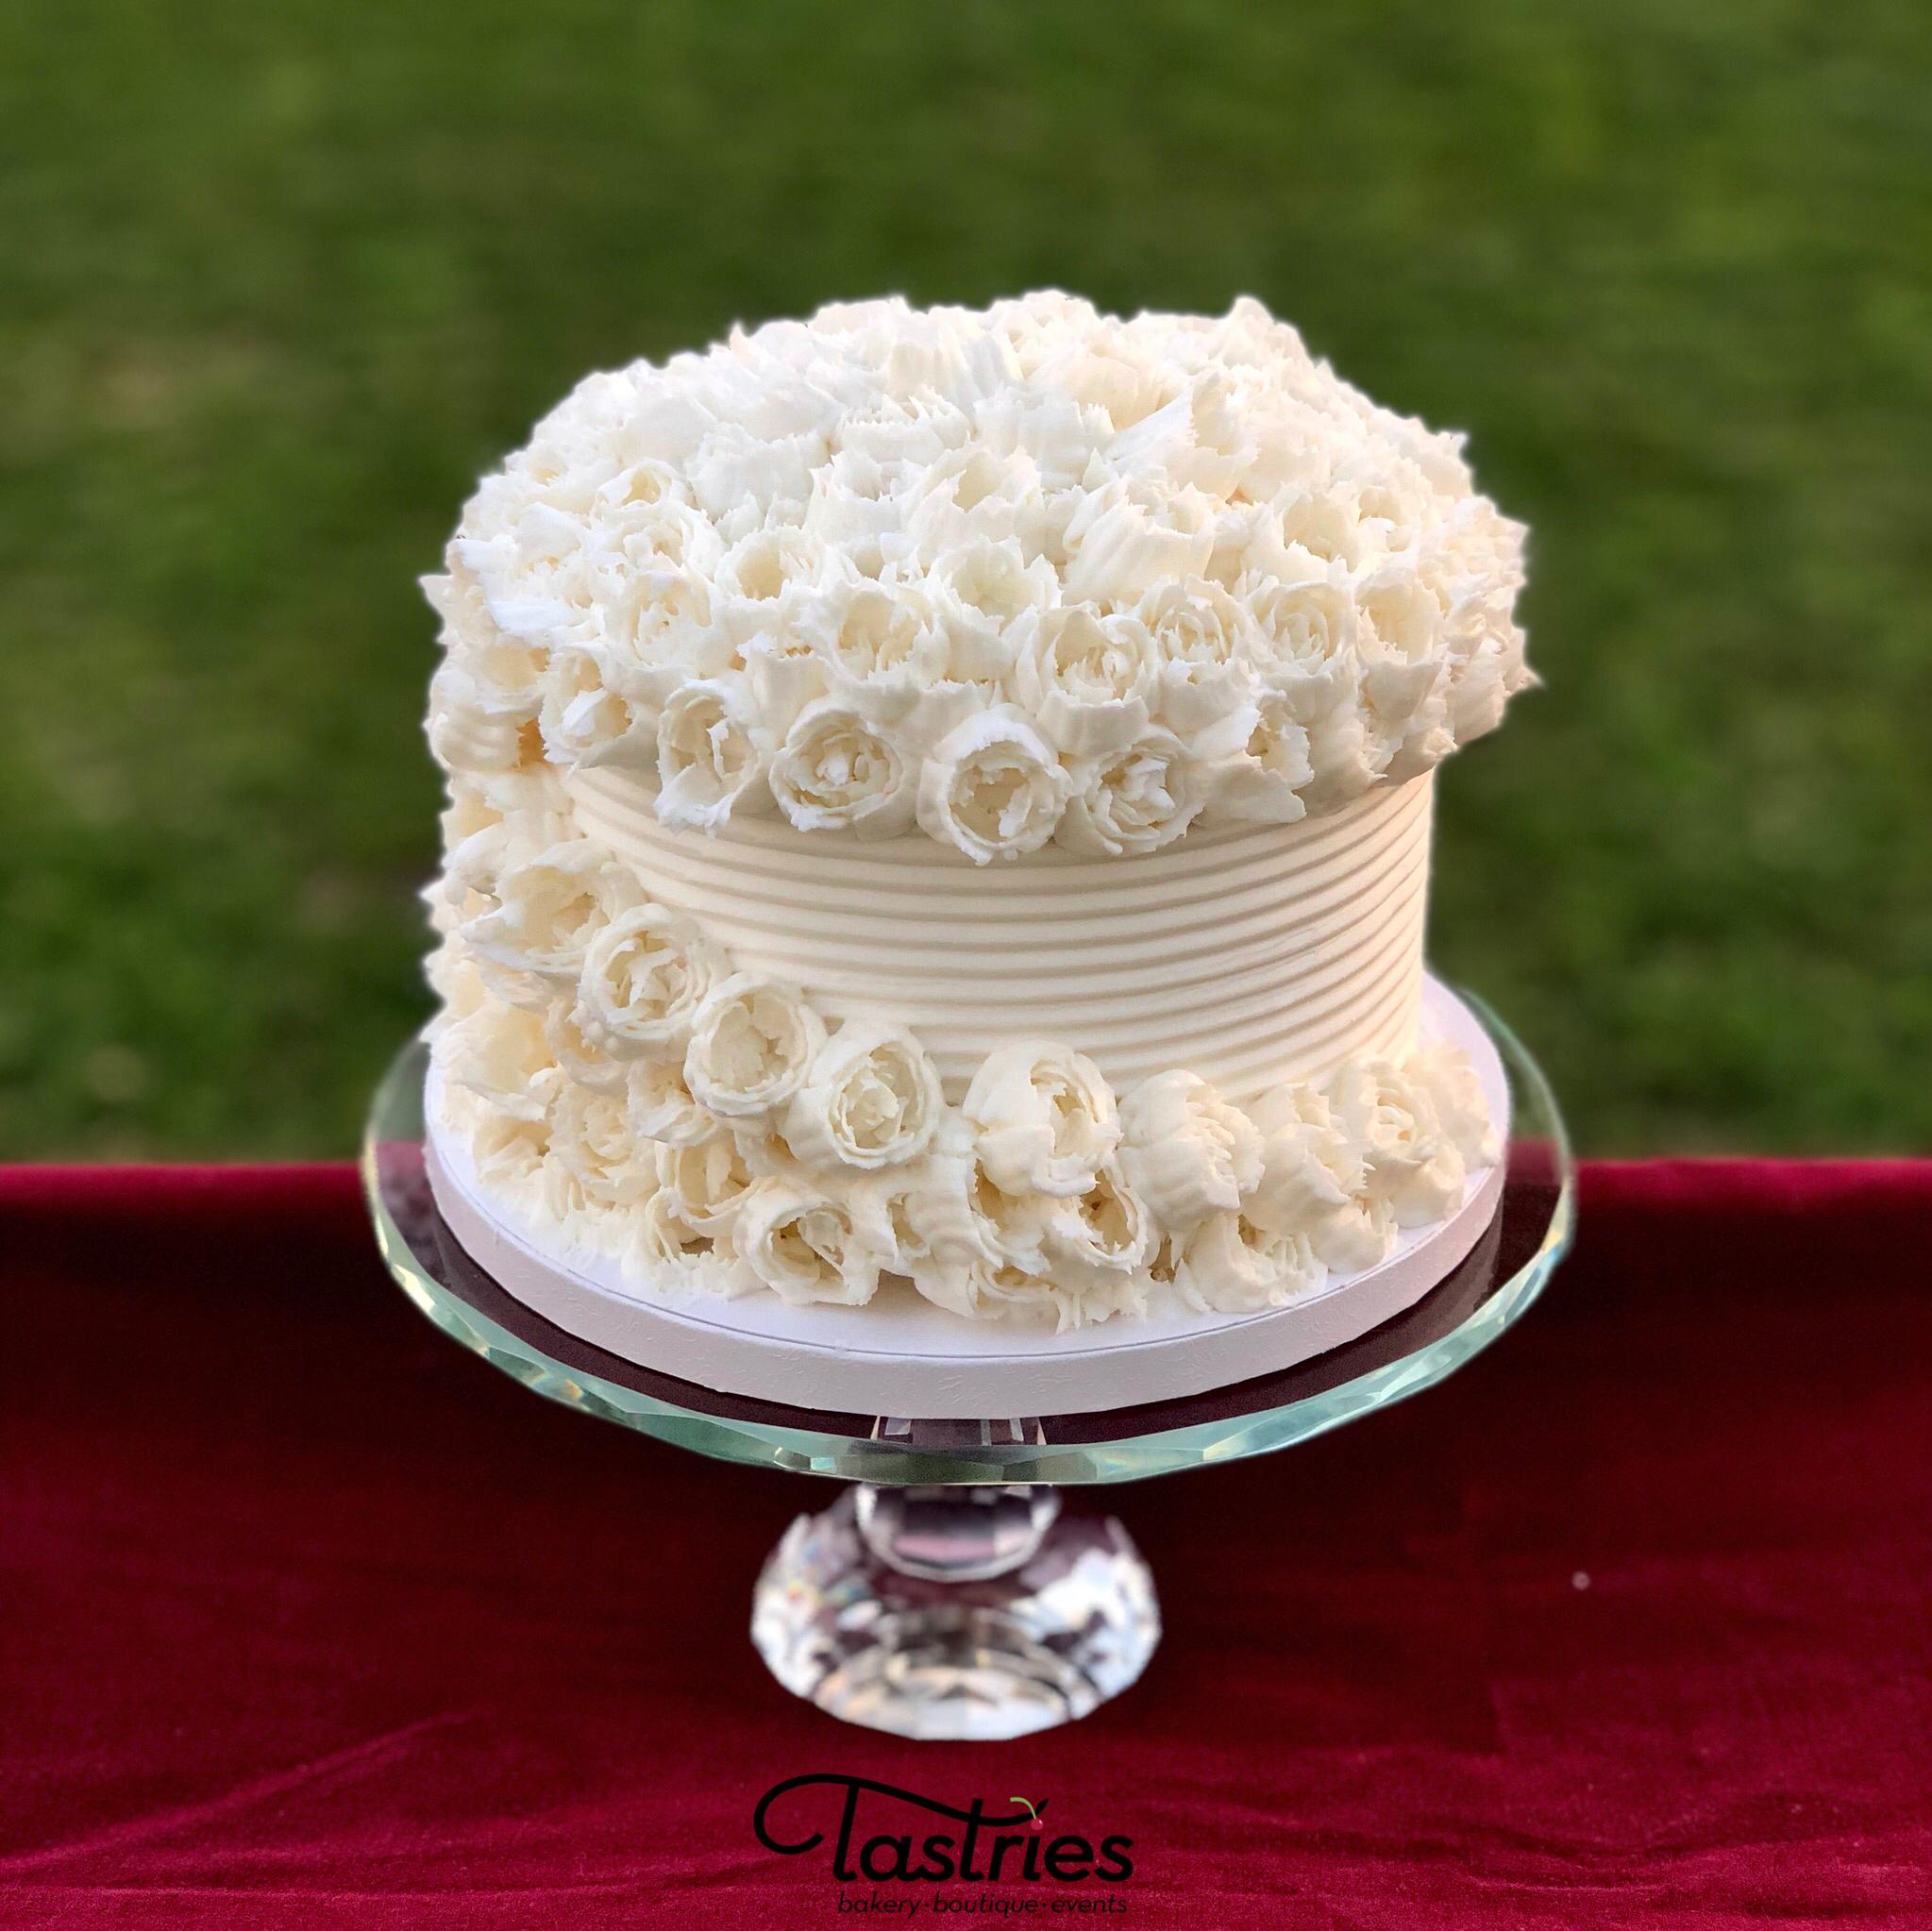 Designer Dessert Cakes, Tastries